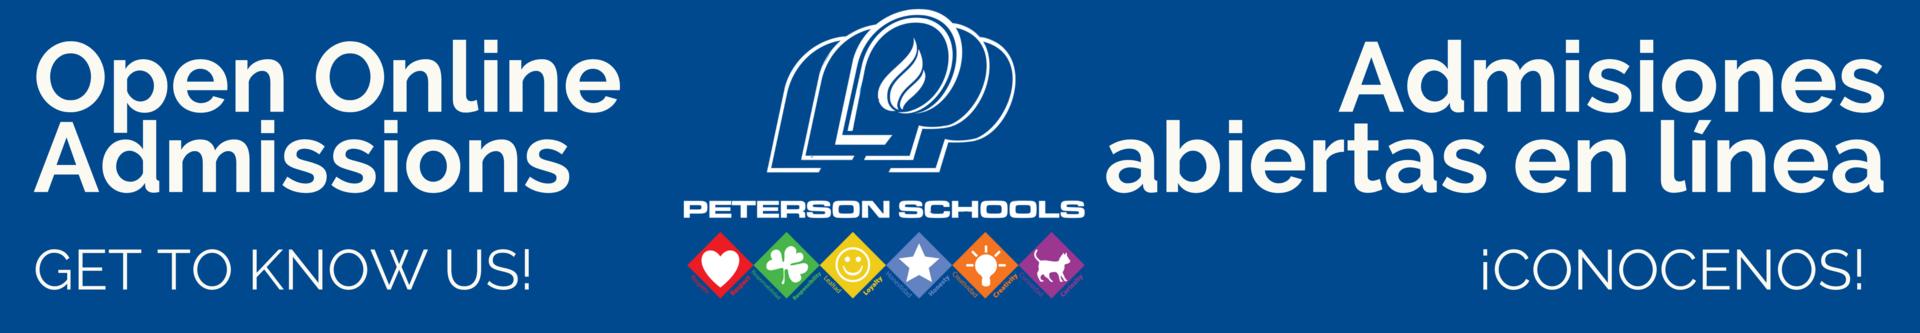 admissions banner website